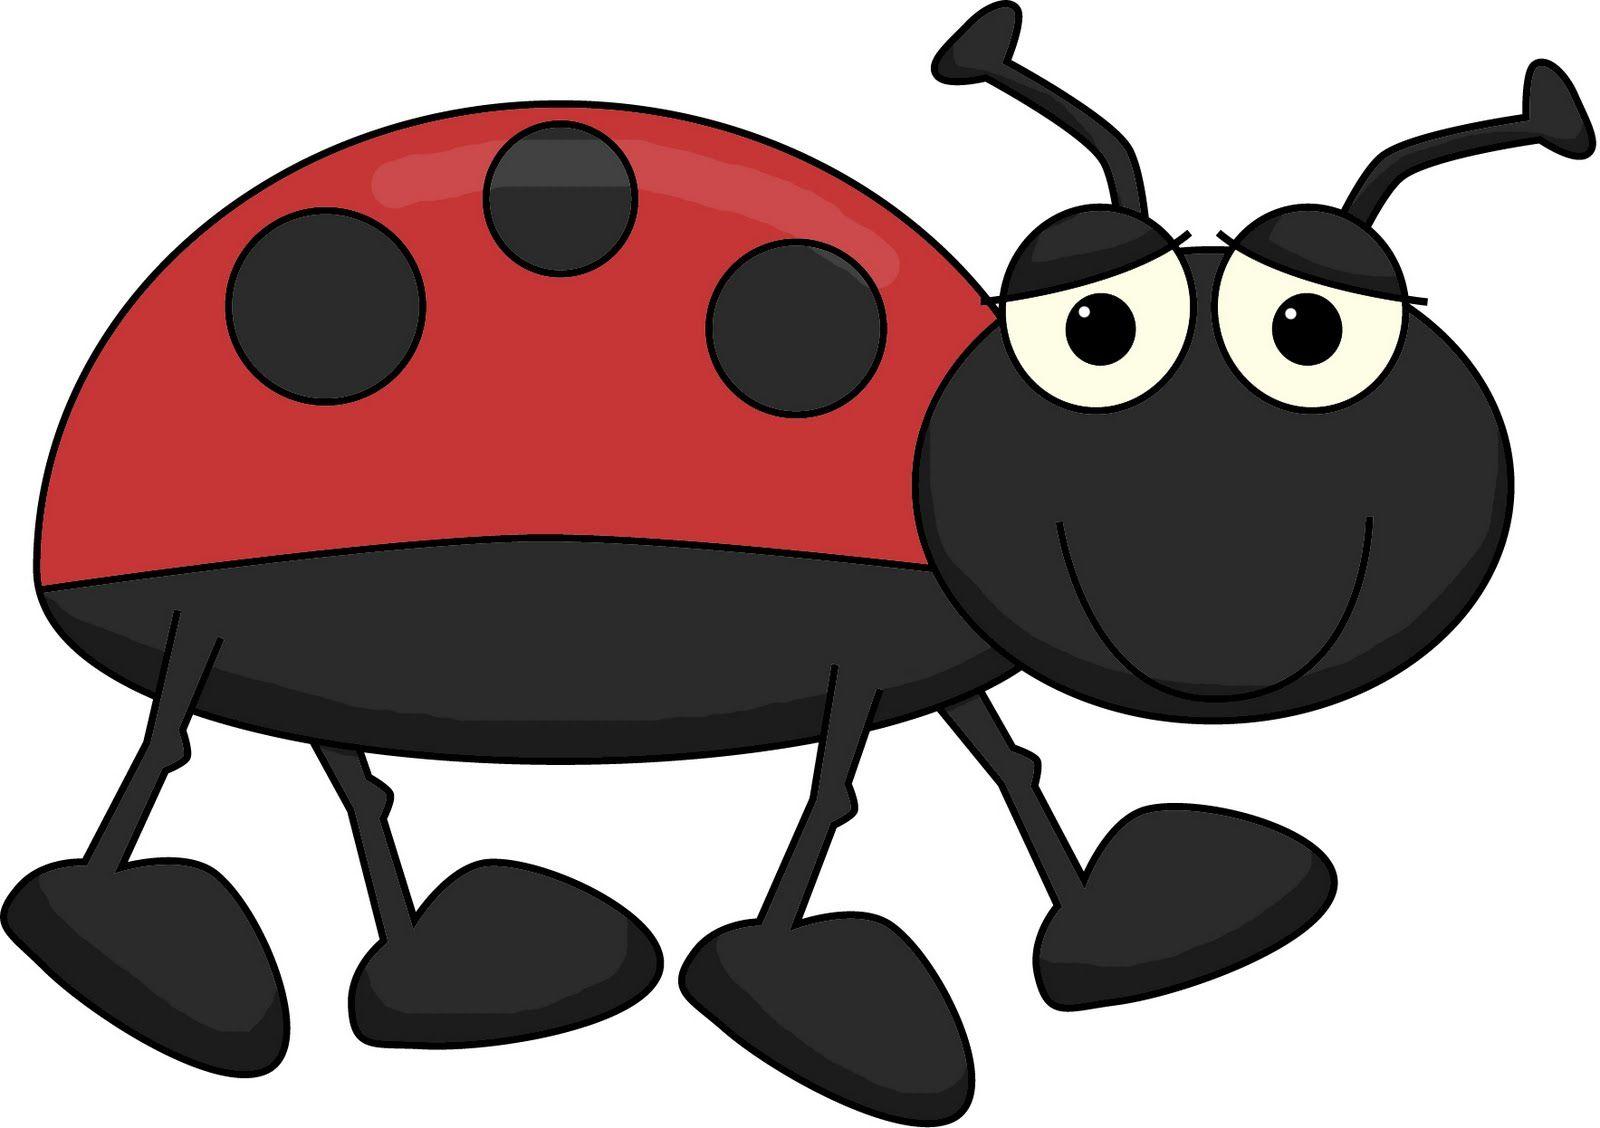 ladybug picture.